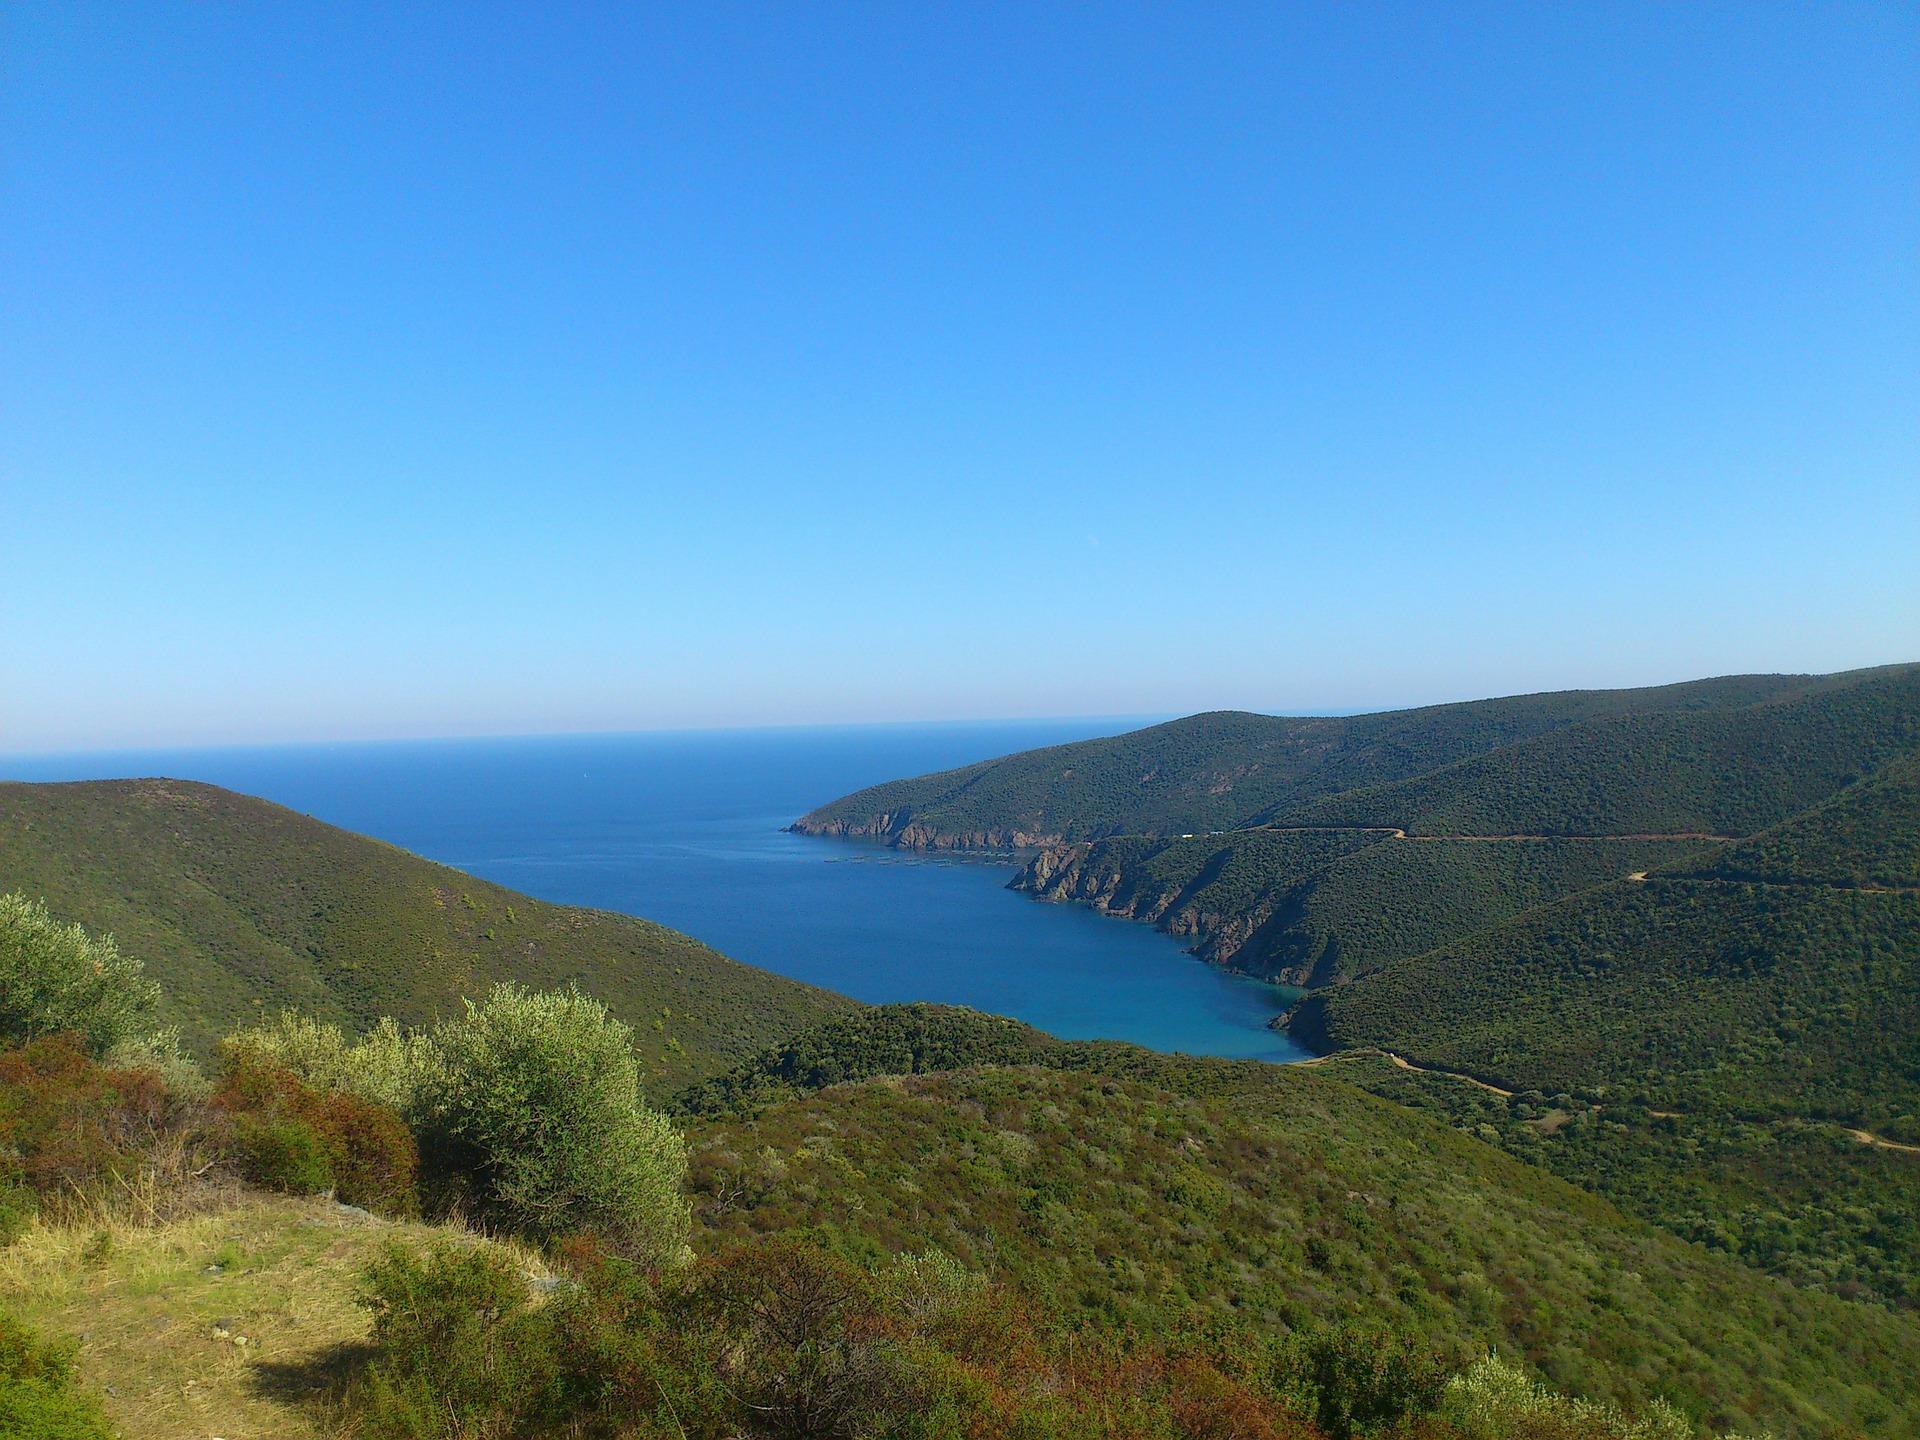 Chalkidiki Meer und Berge